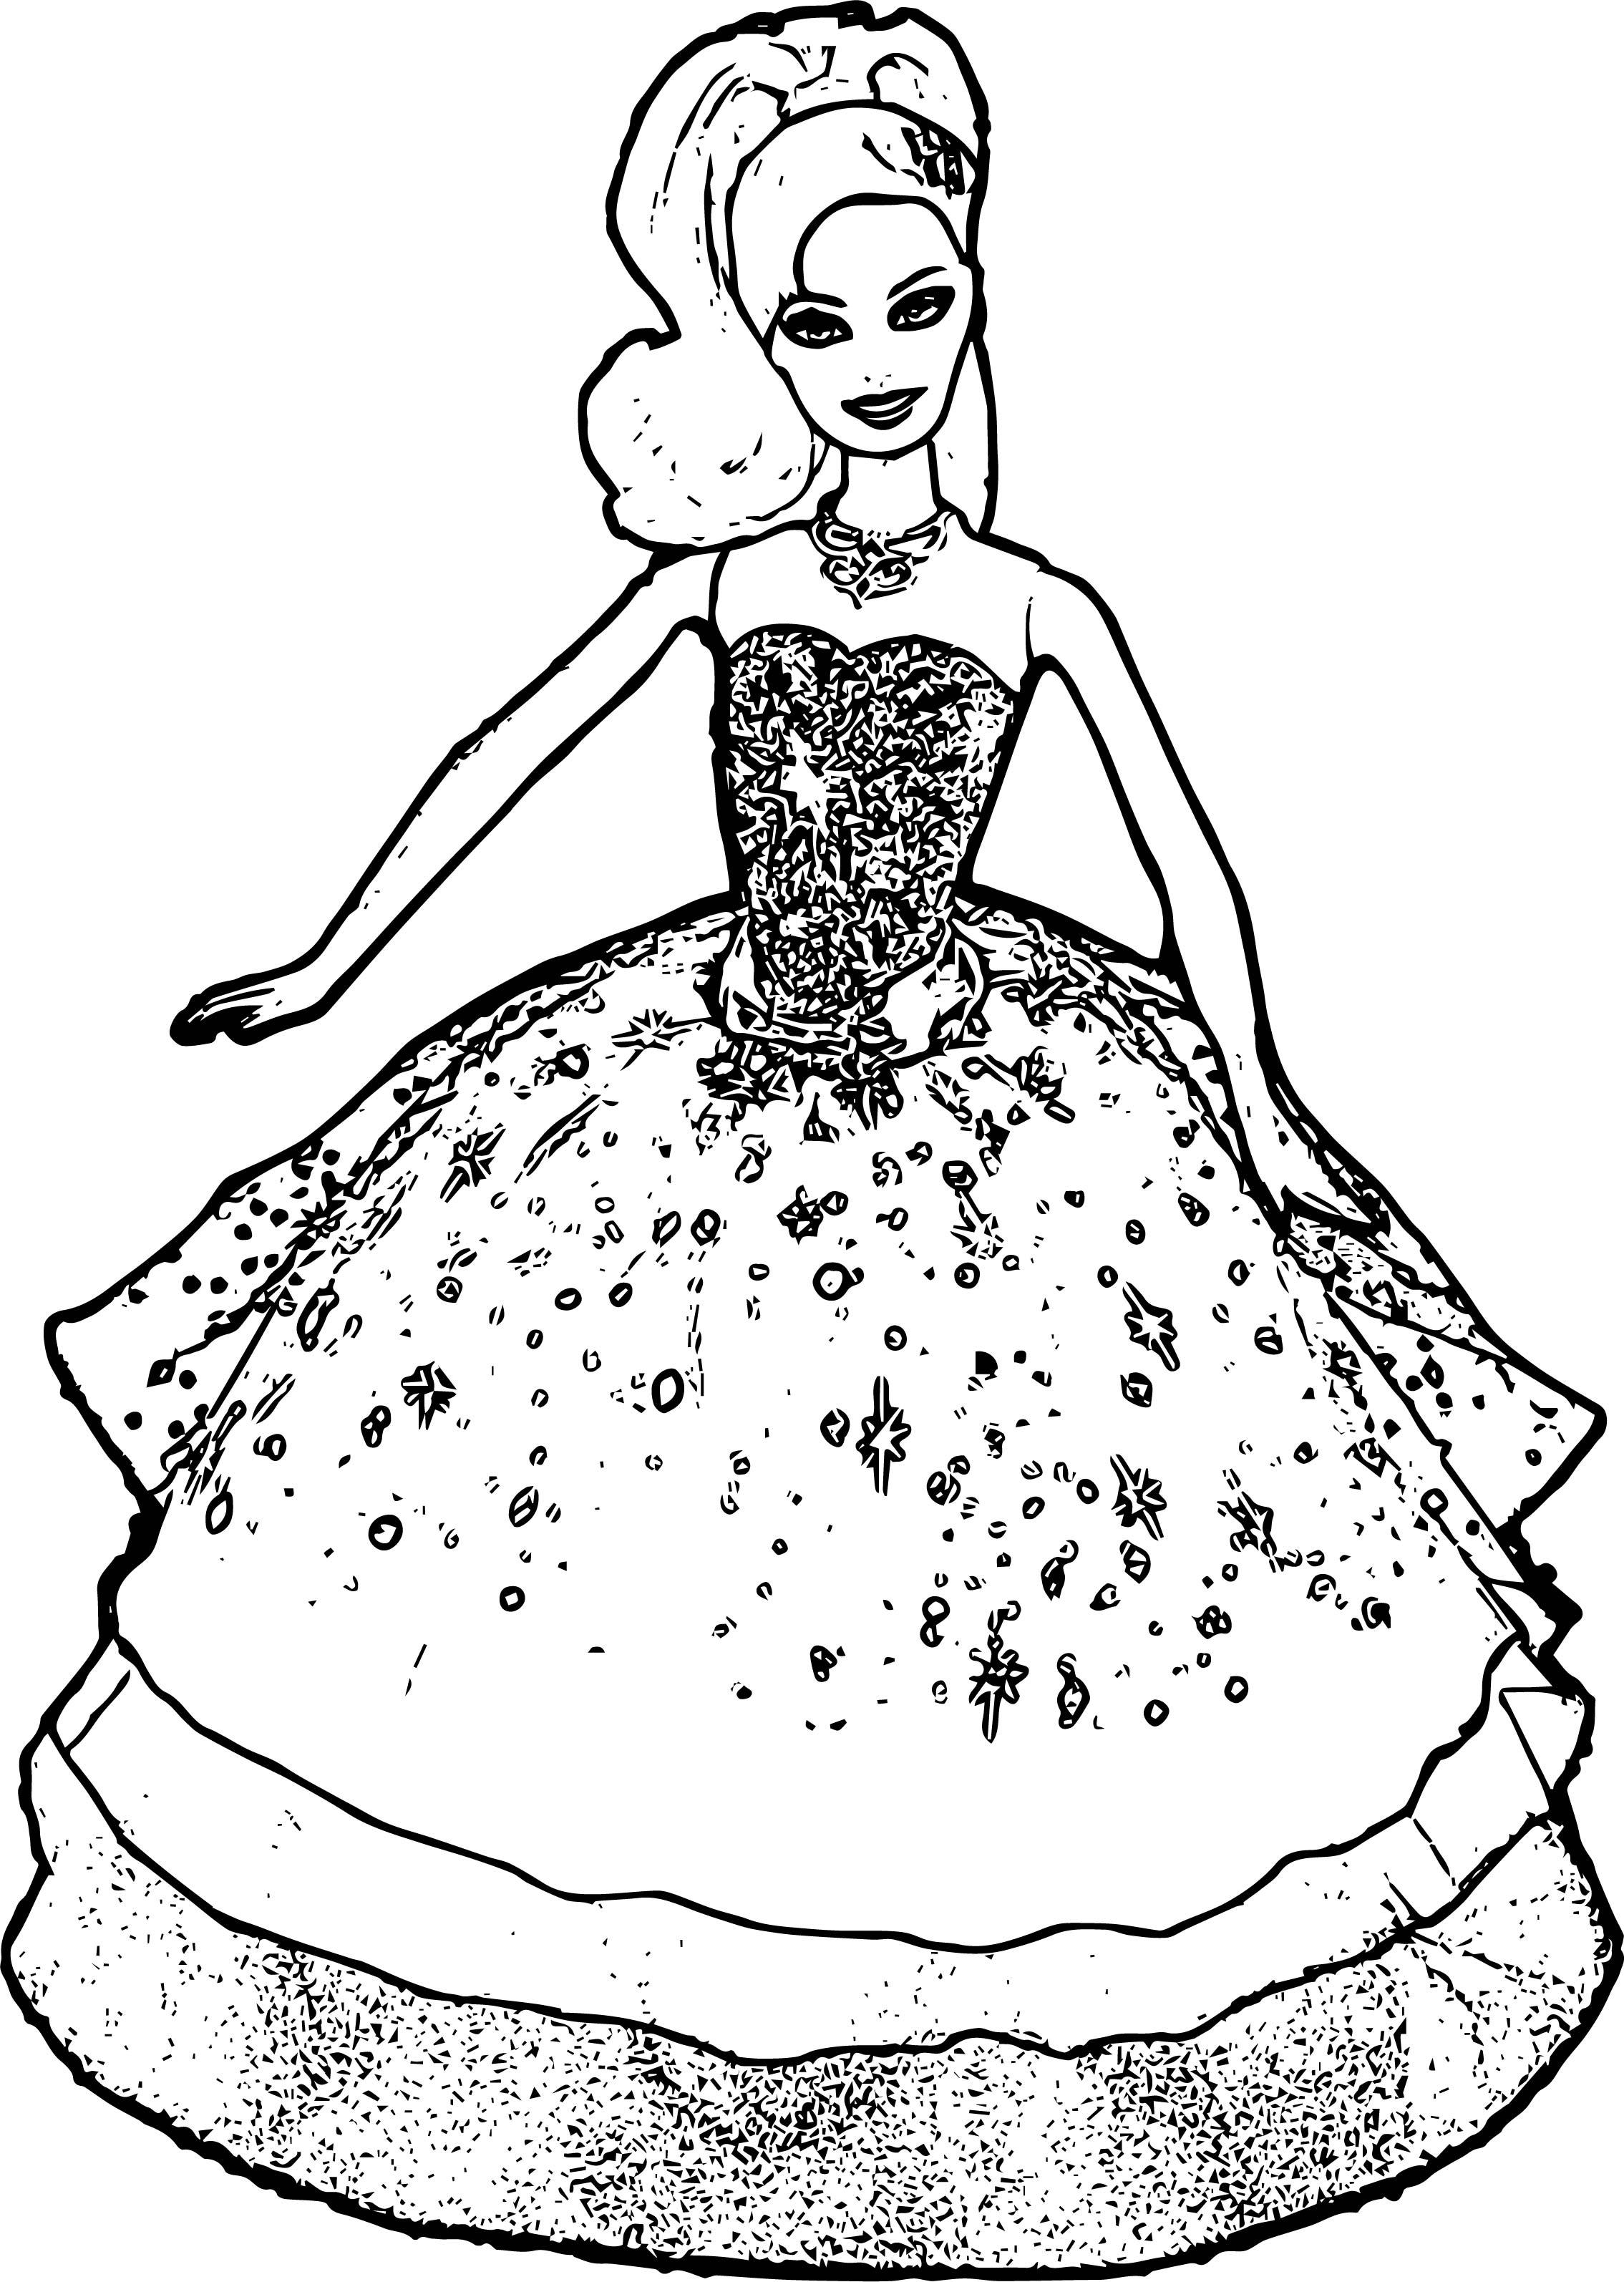 barbie logo coloring pages | Barbie Big Dress Coloring Page | Wecoloringpage.com